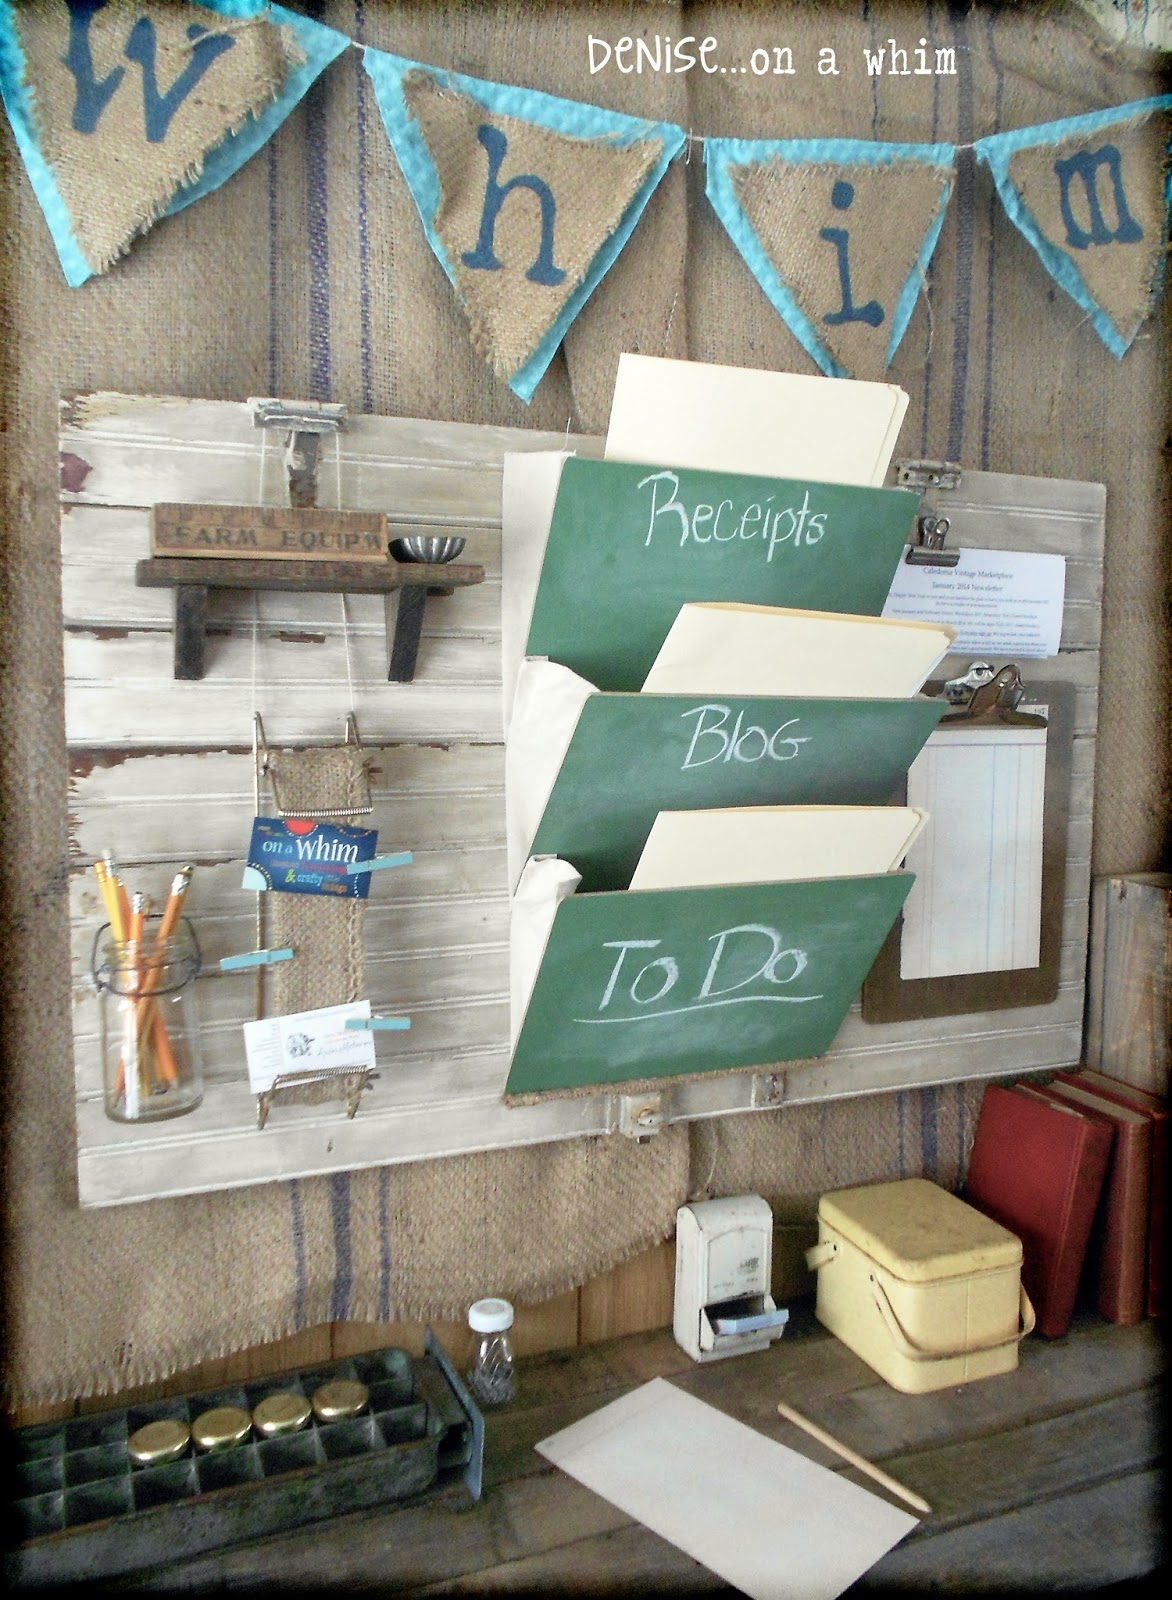 Junky Wall Organizer via http://deniseonawhim.blogspot.com